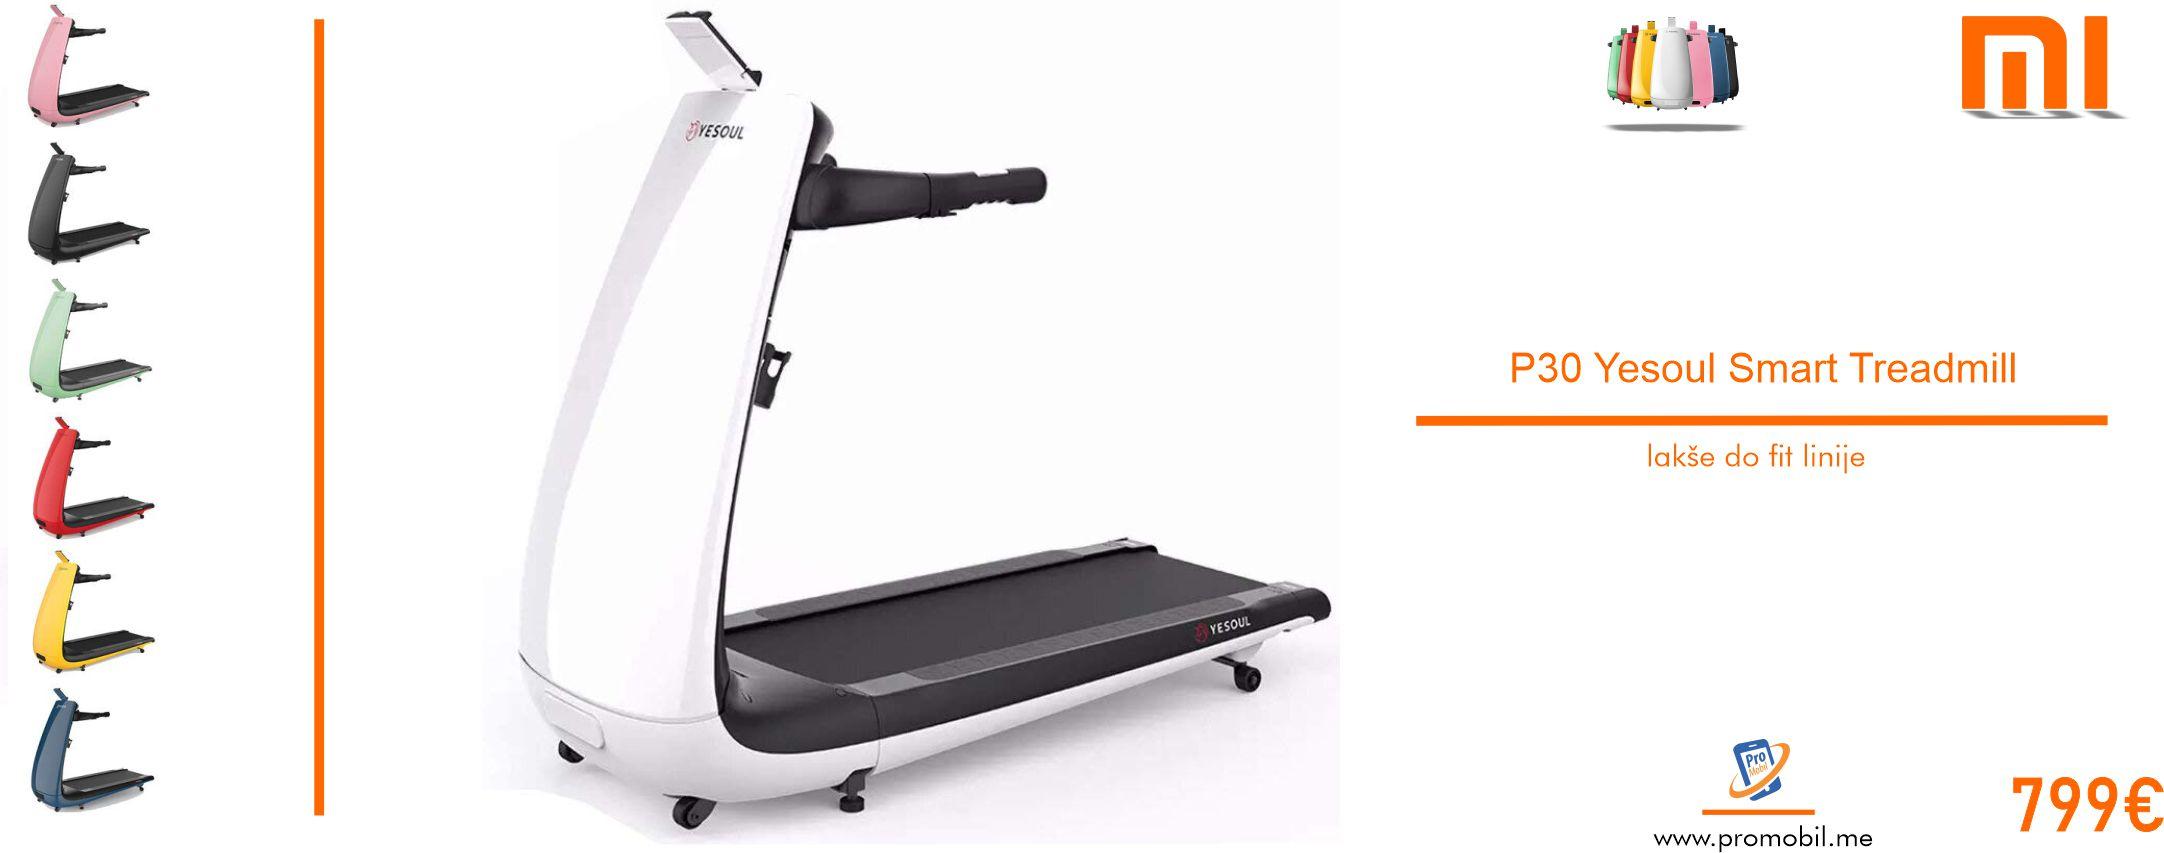 p30 yesoul treadmill